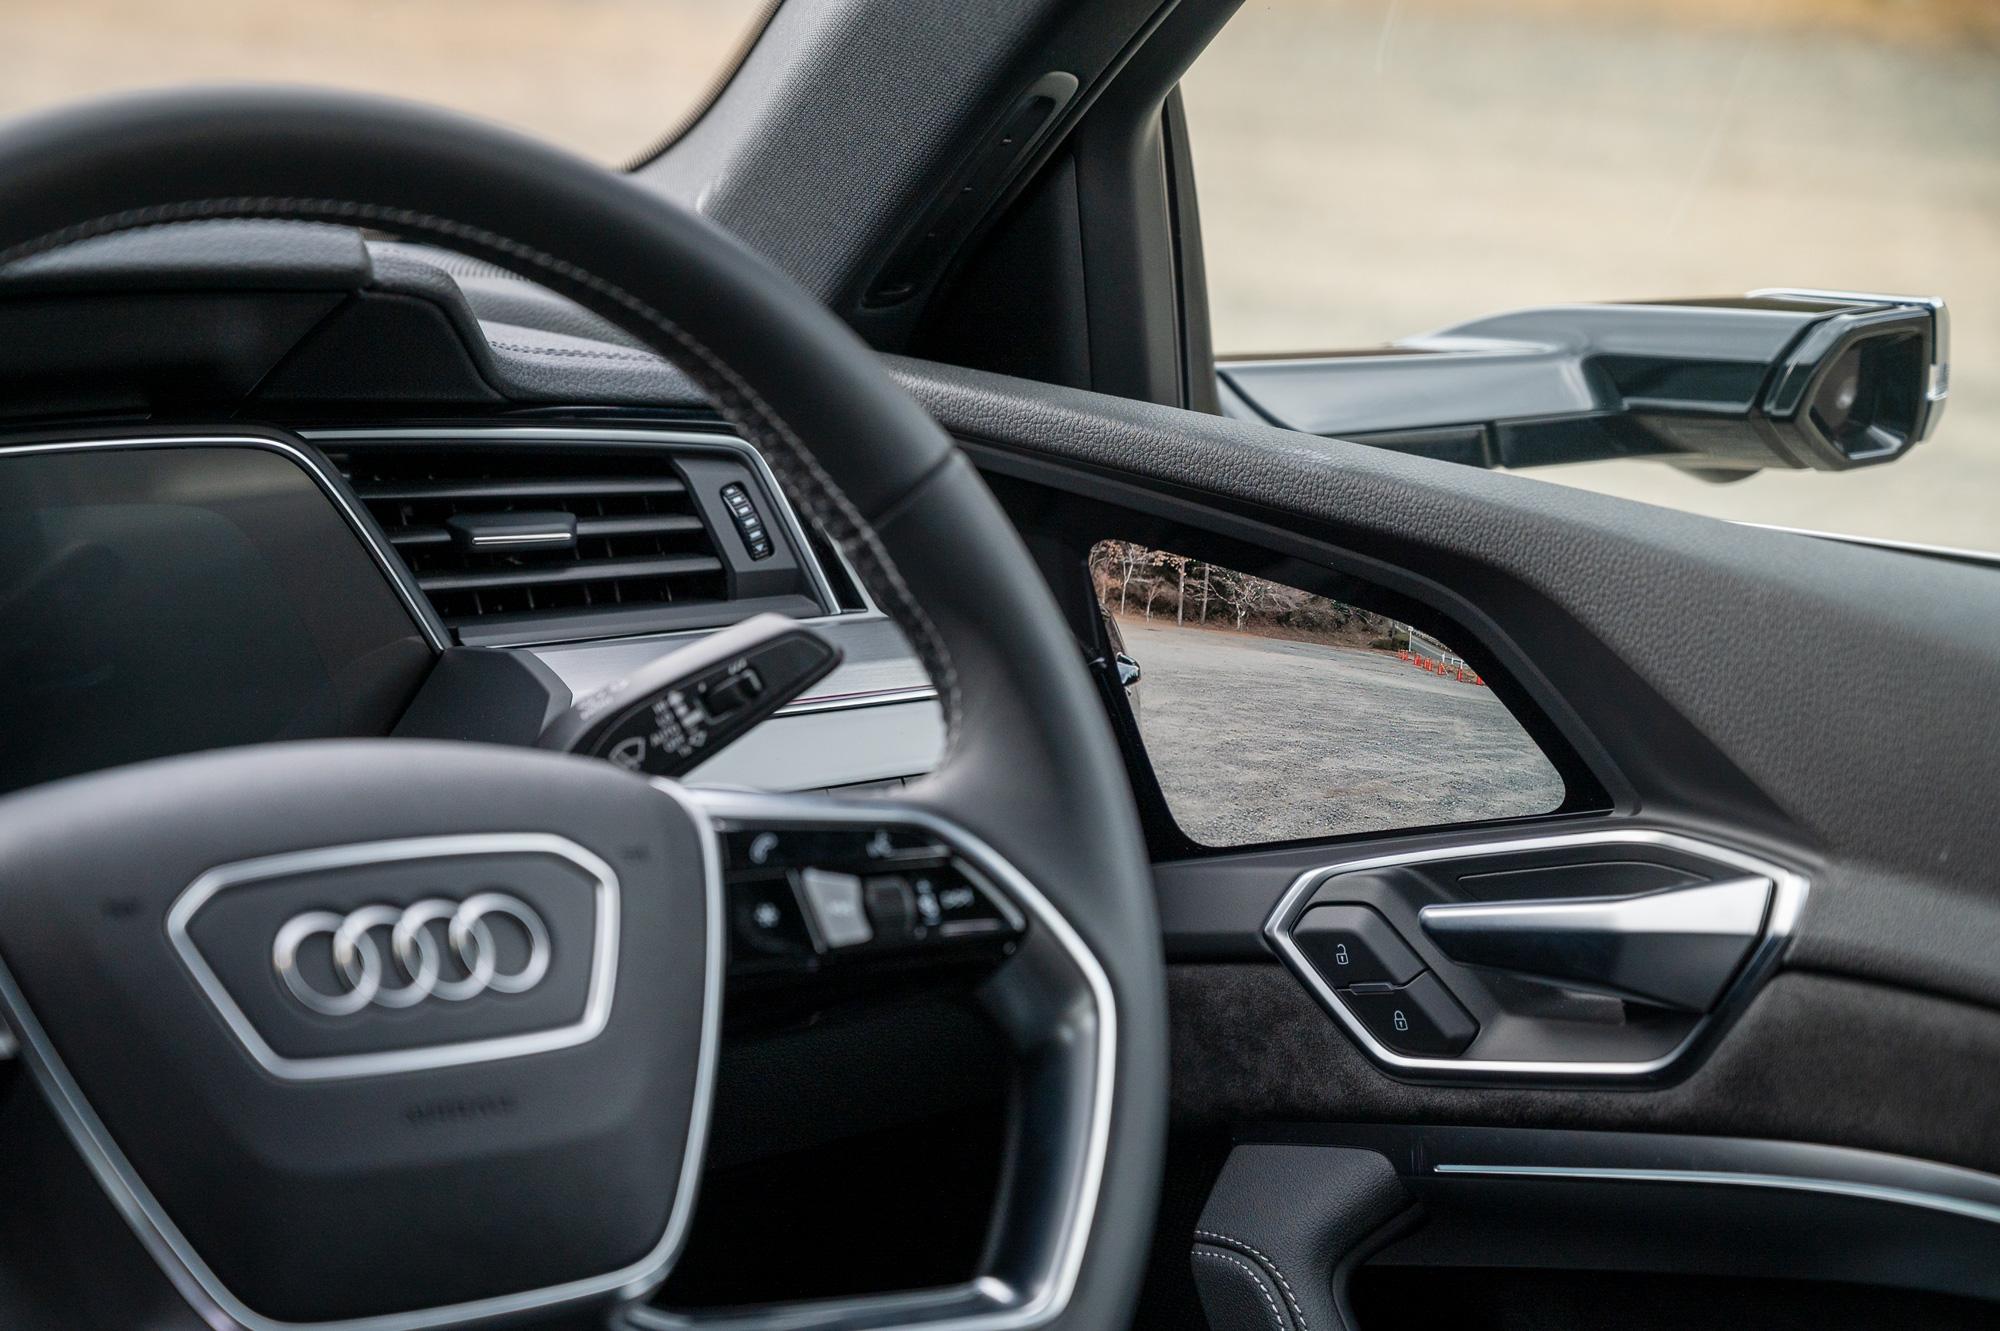 Audi e-tron バーチャルエクステリアミラー